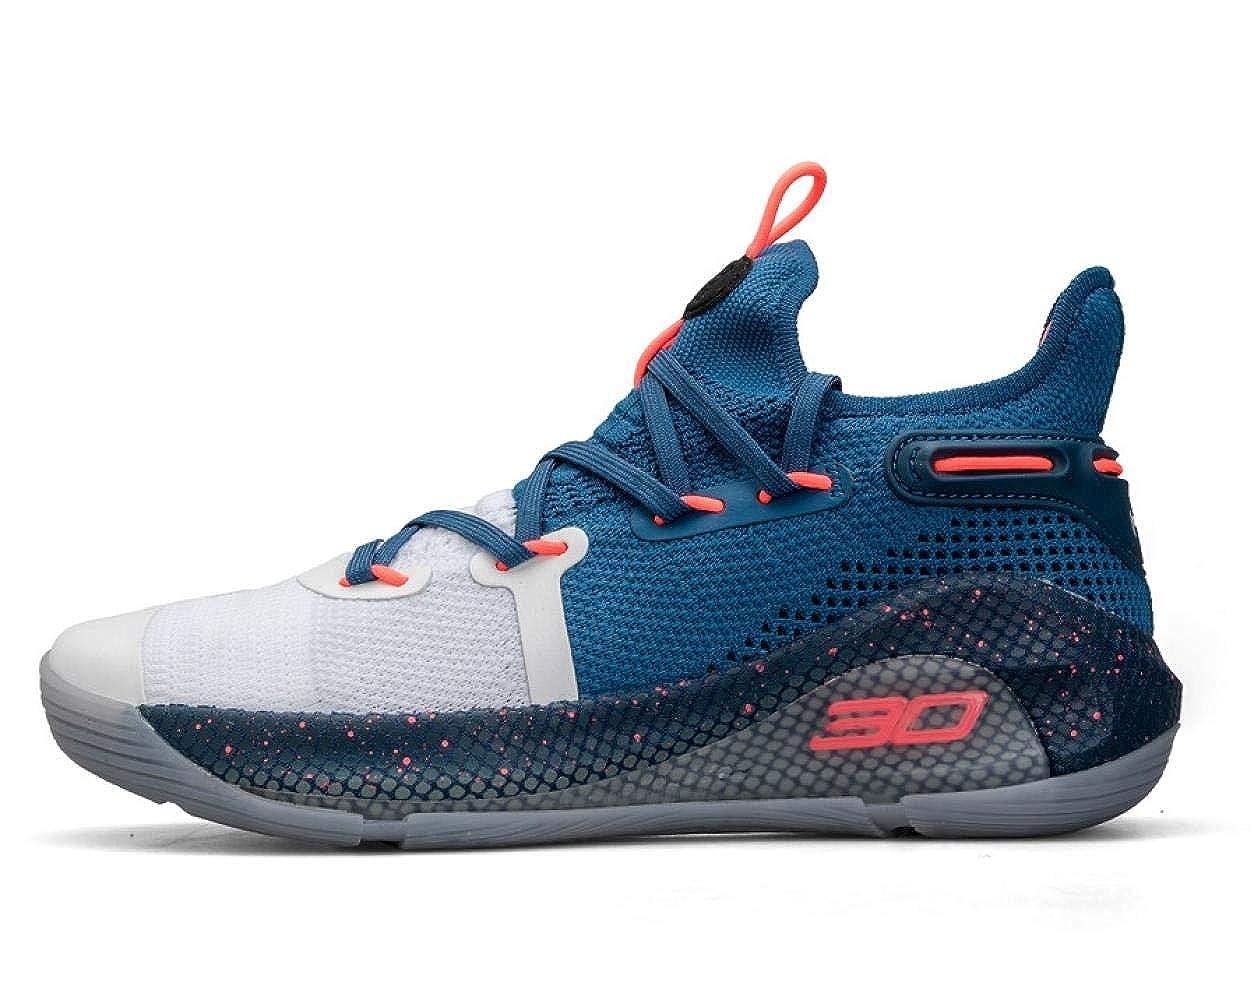 hot sale online 5a4ac d2db3 Amazon.com | jzjwmza Curry 6 Generation Basketball Shoes ...